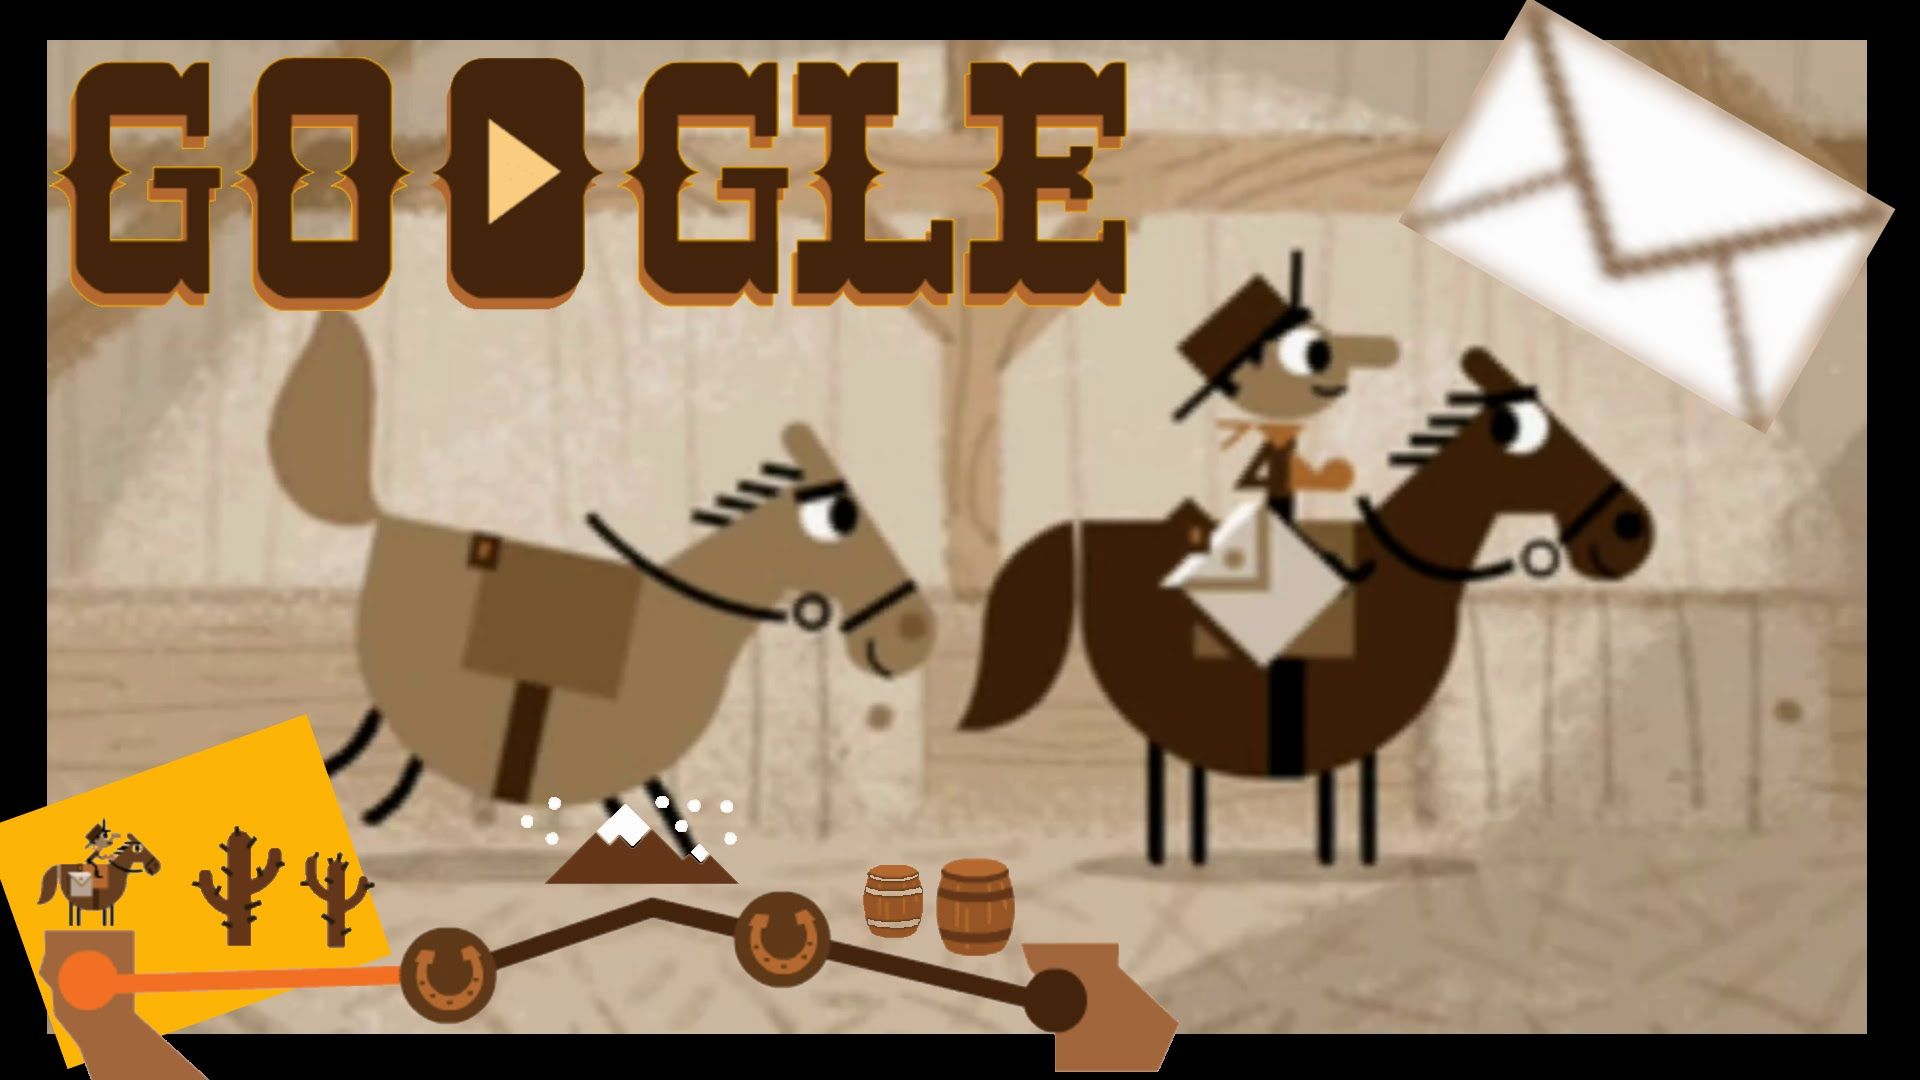 Google Pony Express All 100 Letters Delivered Complete Walkthrough Of The Google Doodle Game Doodles Games Google Doodle Games Google Doodles